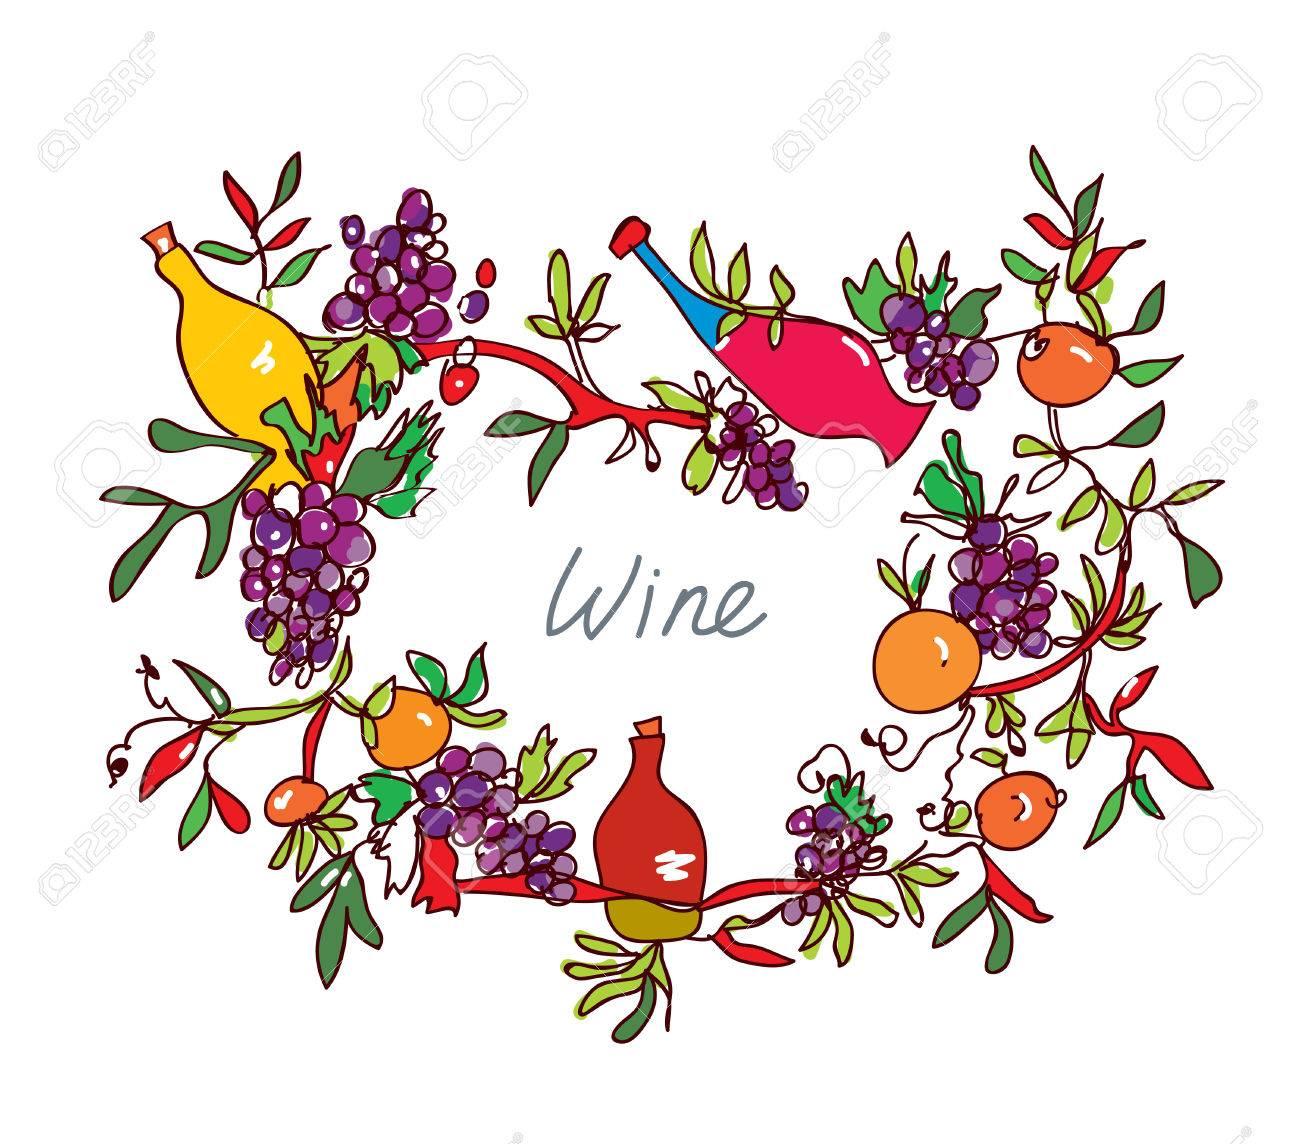 Ornamental bottles - Frame For Wine With Leaves And Bottles Ornamental Vector Illustration Stock Vector 53440661